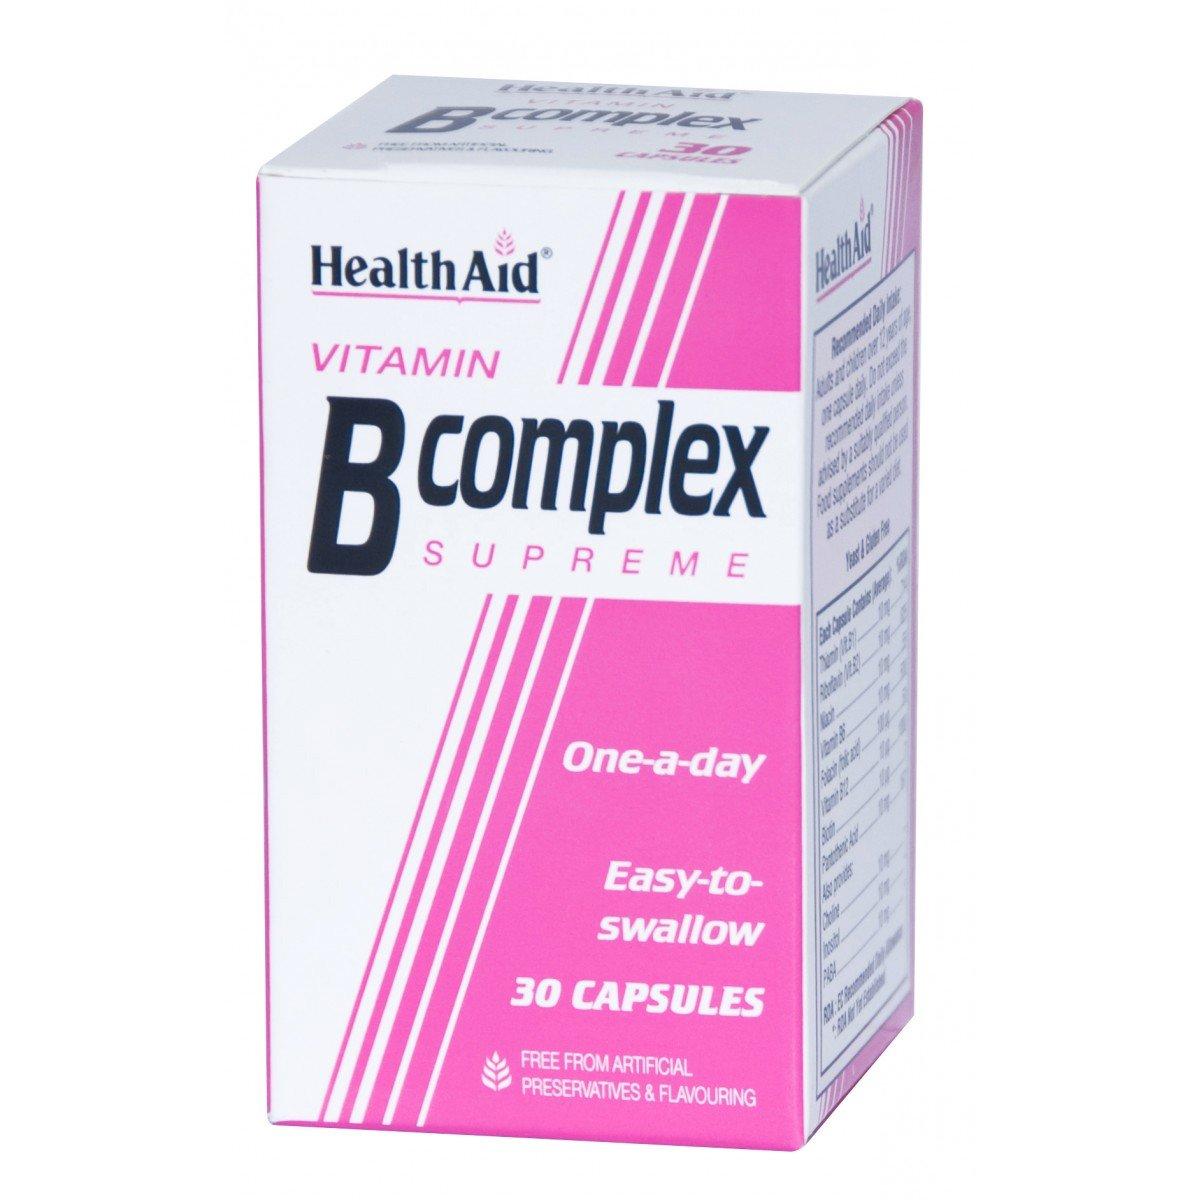 Health Aid B Complex Supreme Σύμπλεγμα Βιταμινών Β 30caps